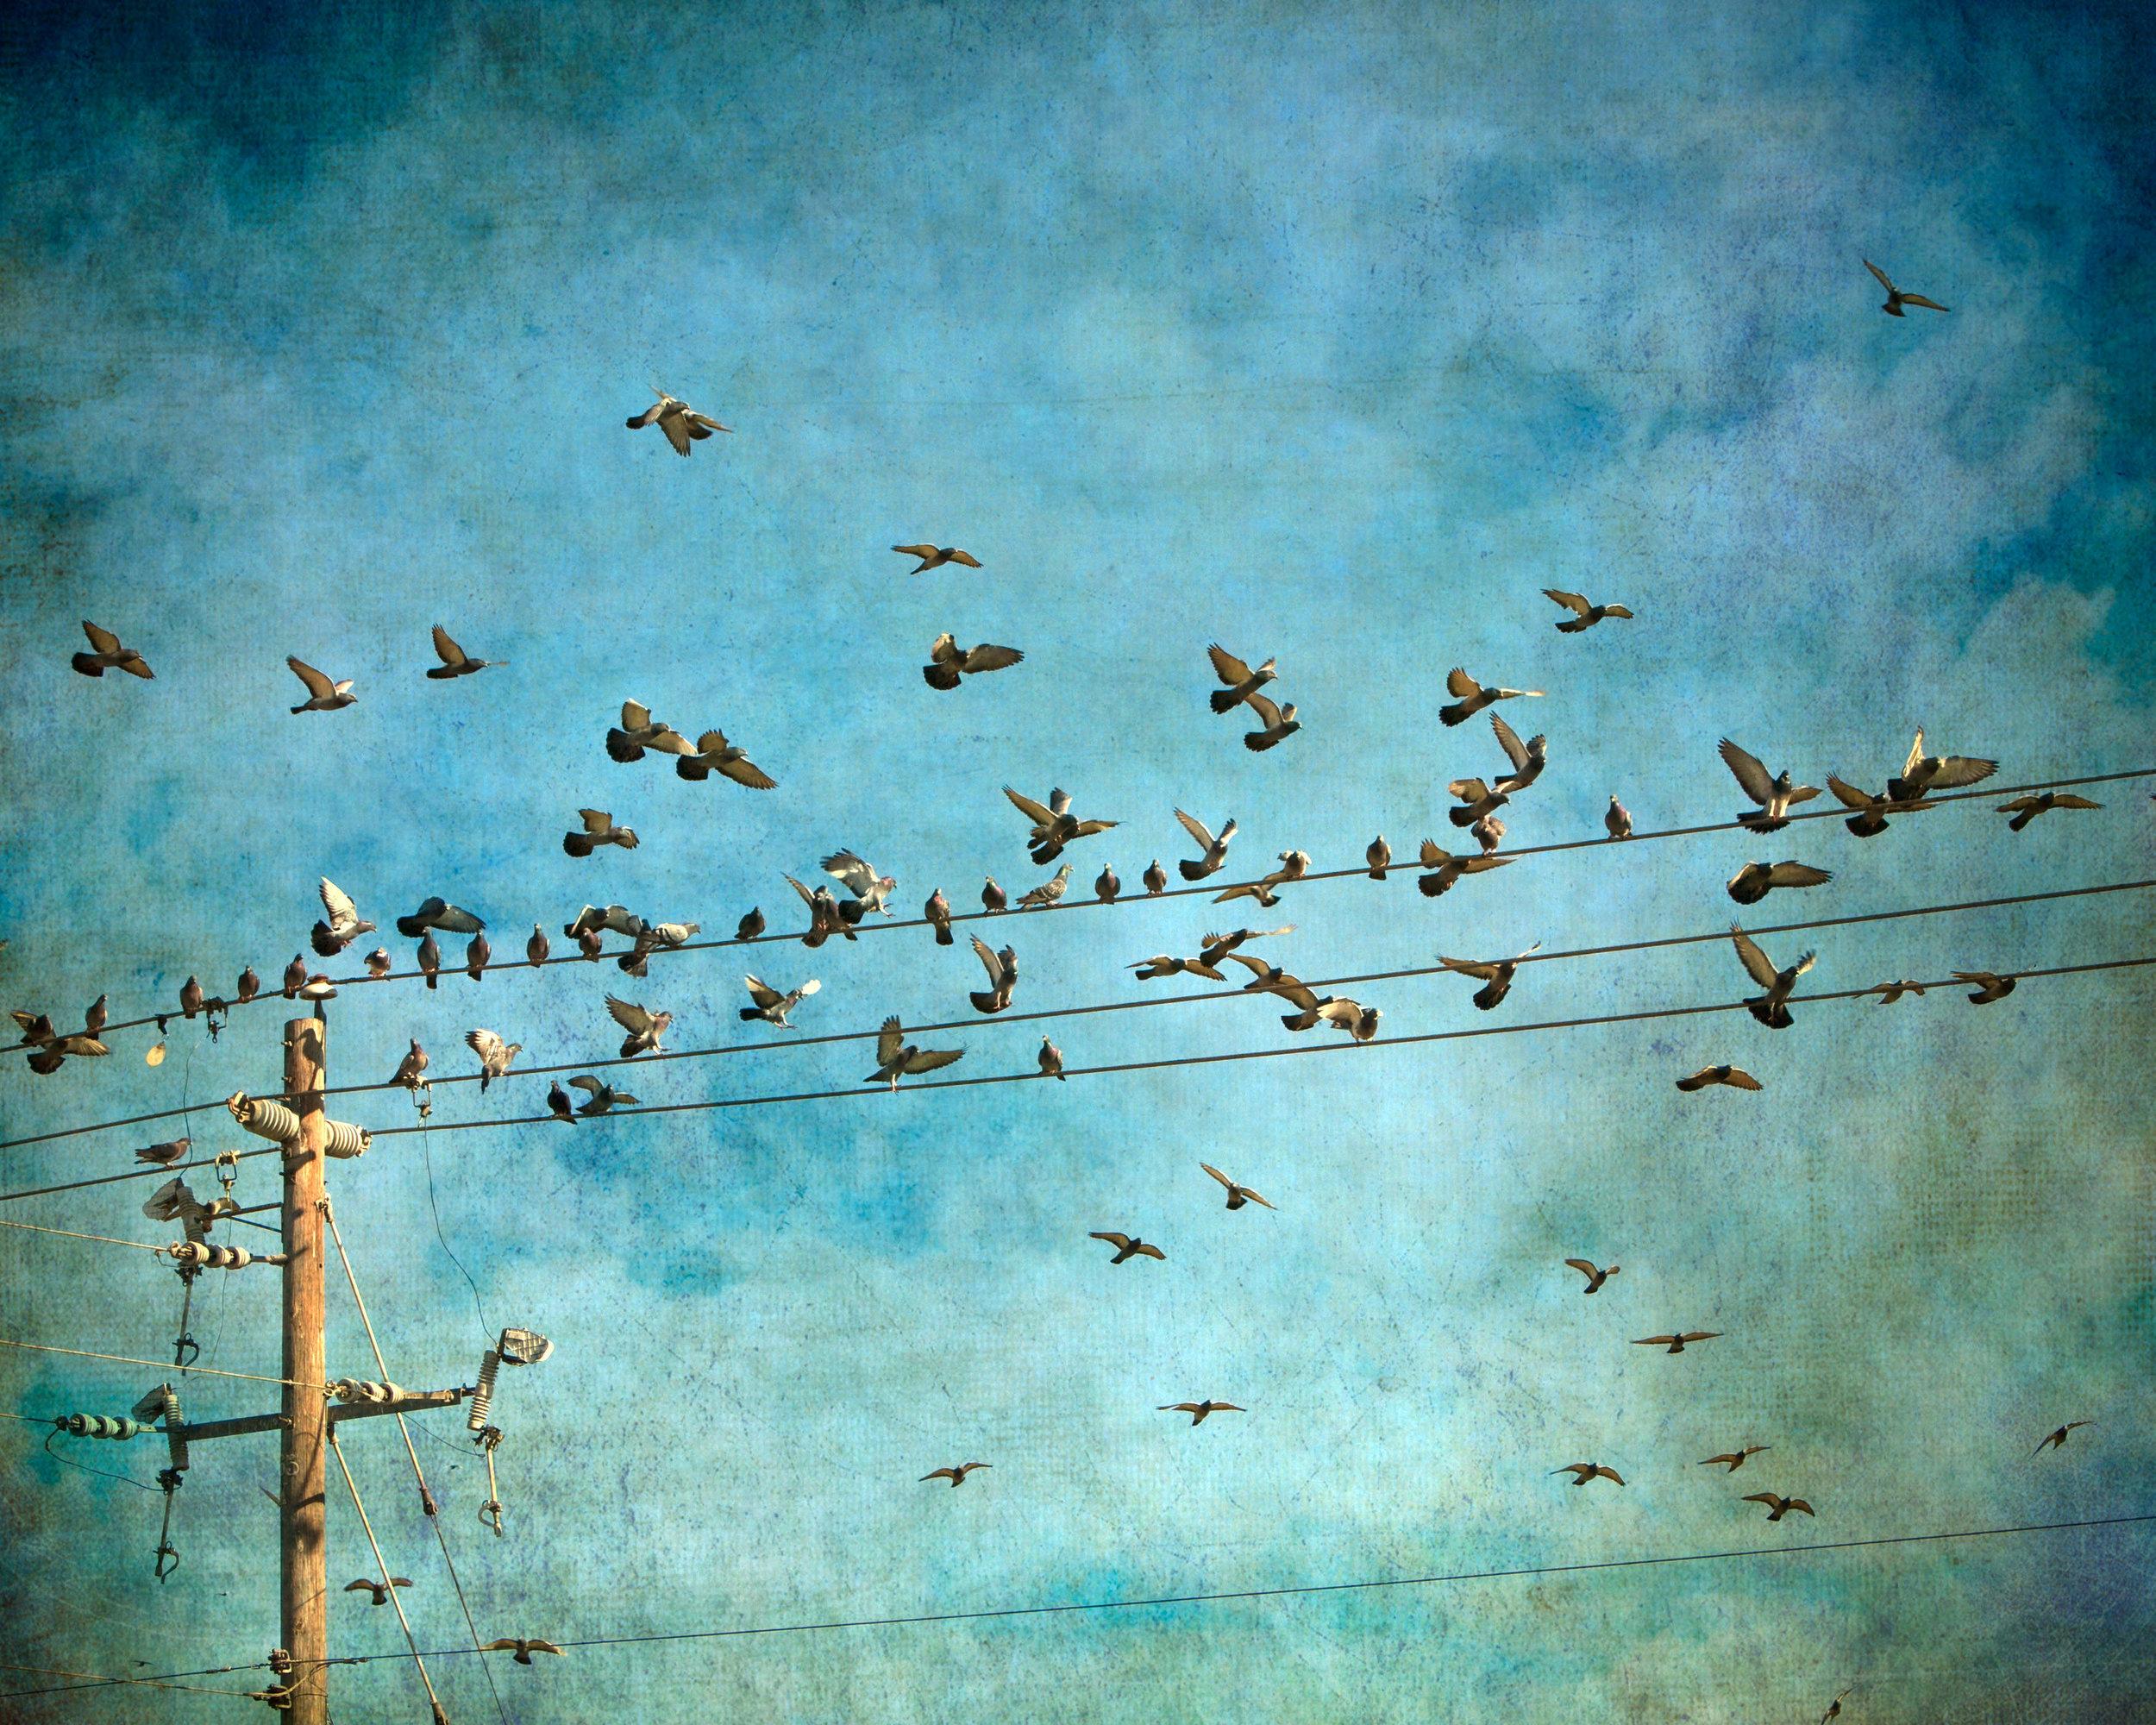 beginning-birds-4x5r-3154.jpg